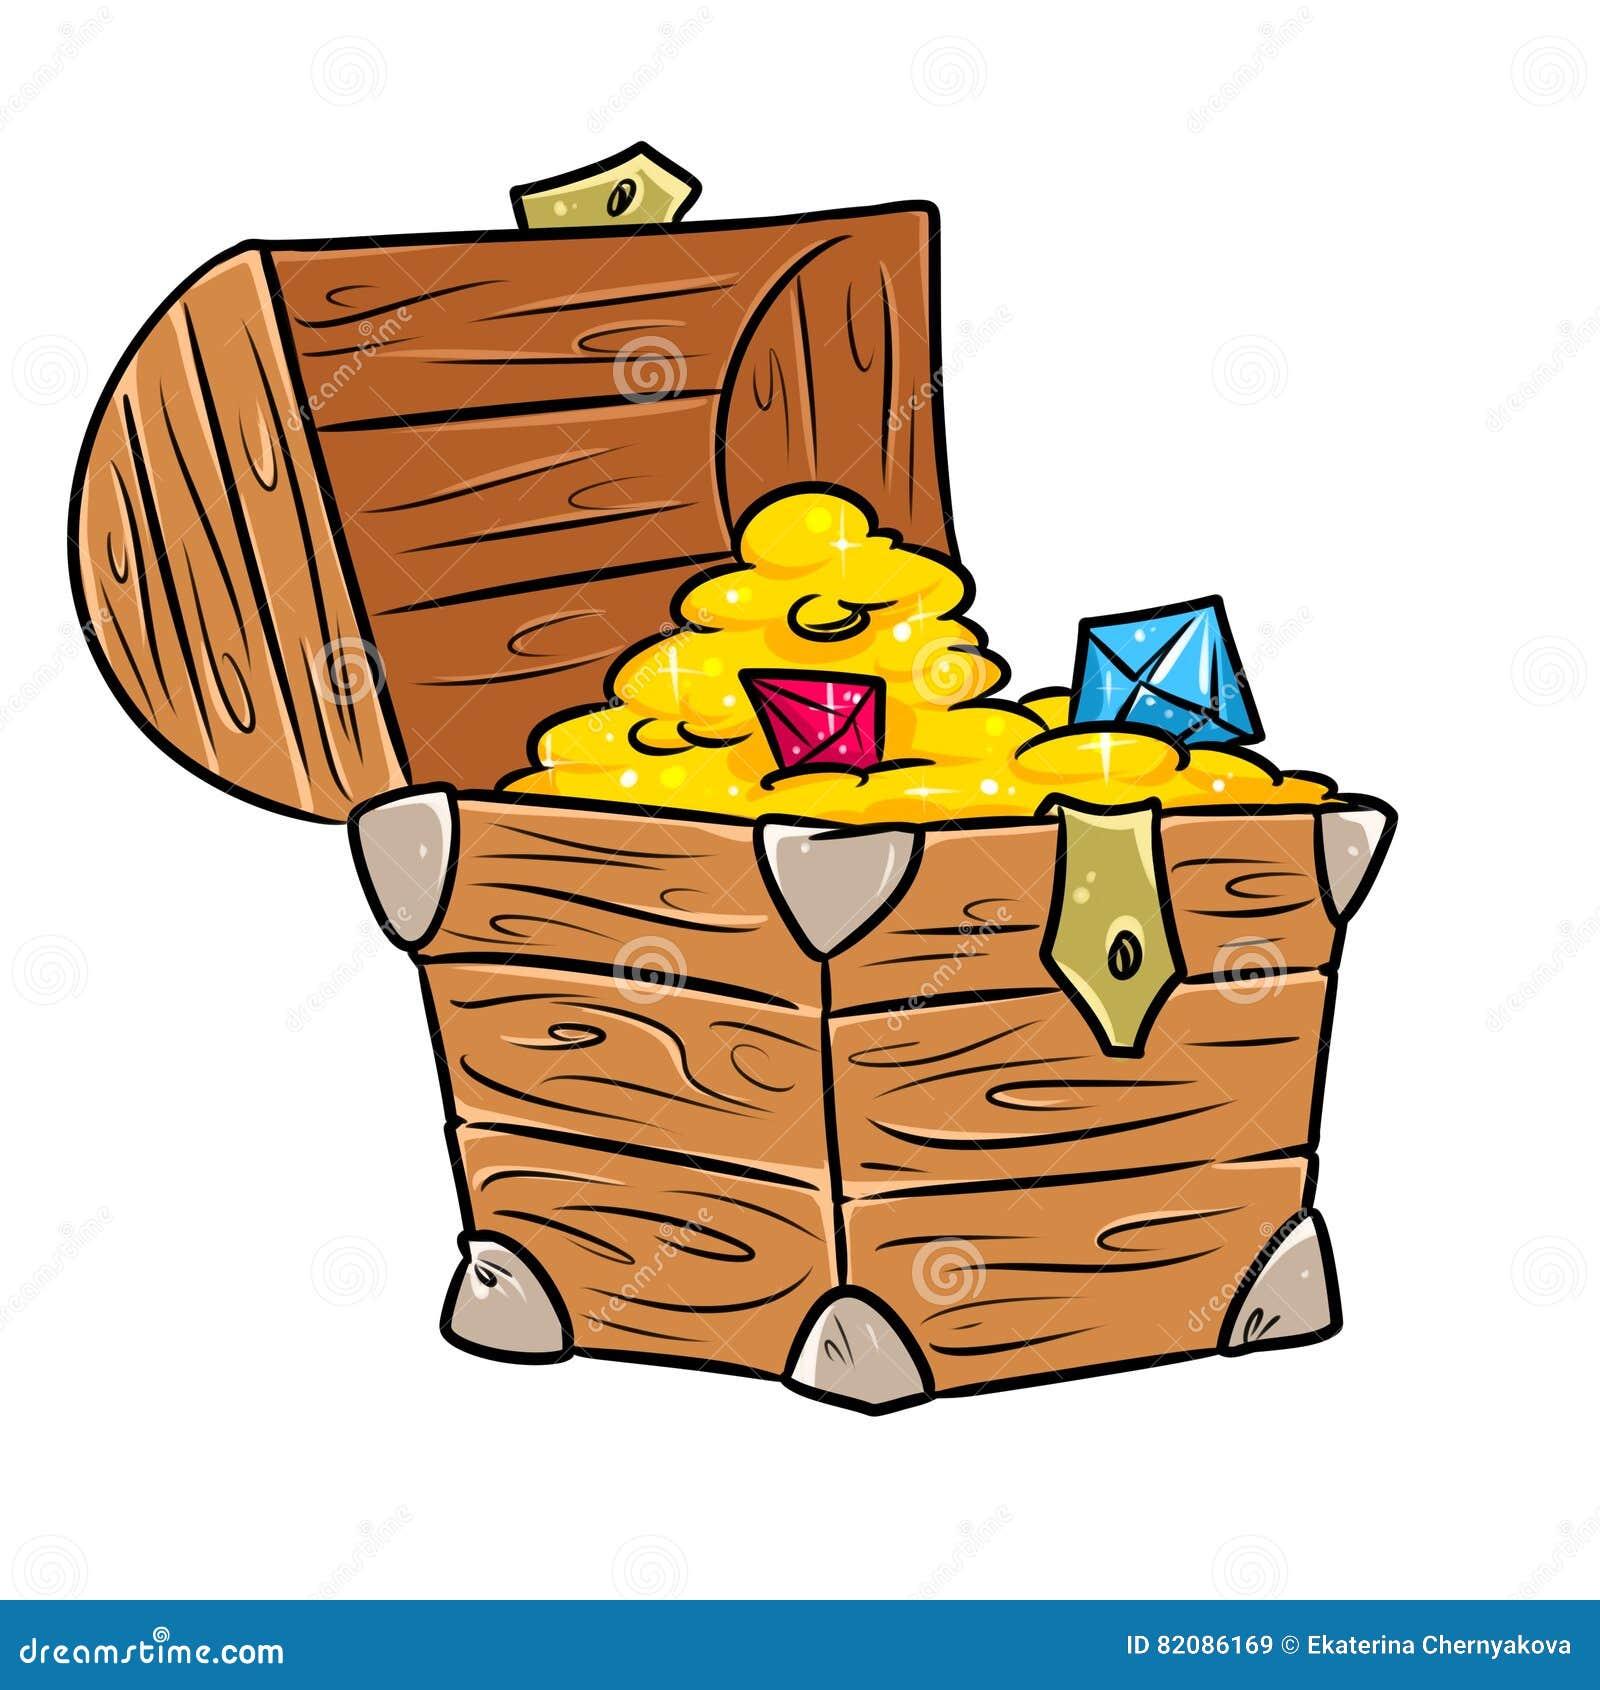 treasure chest cartoon stock illustration illustration of graphics rh dreamstime com free treasure chest clipart images wooden treasure chest clipart free